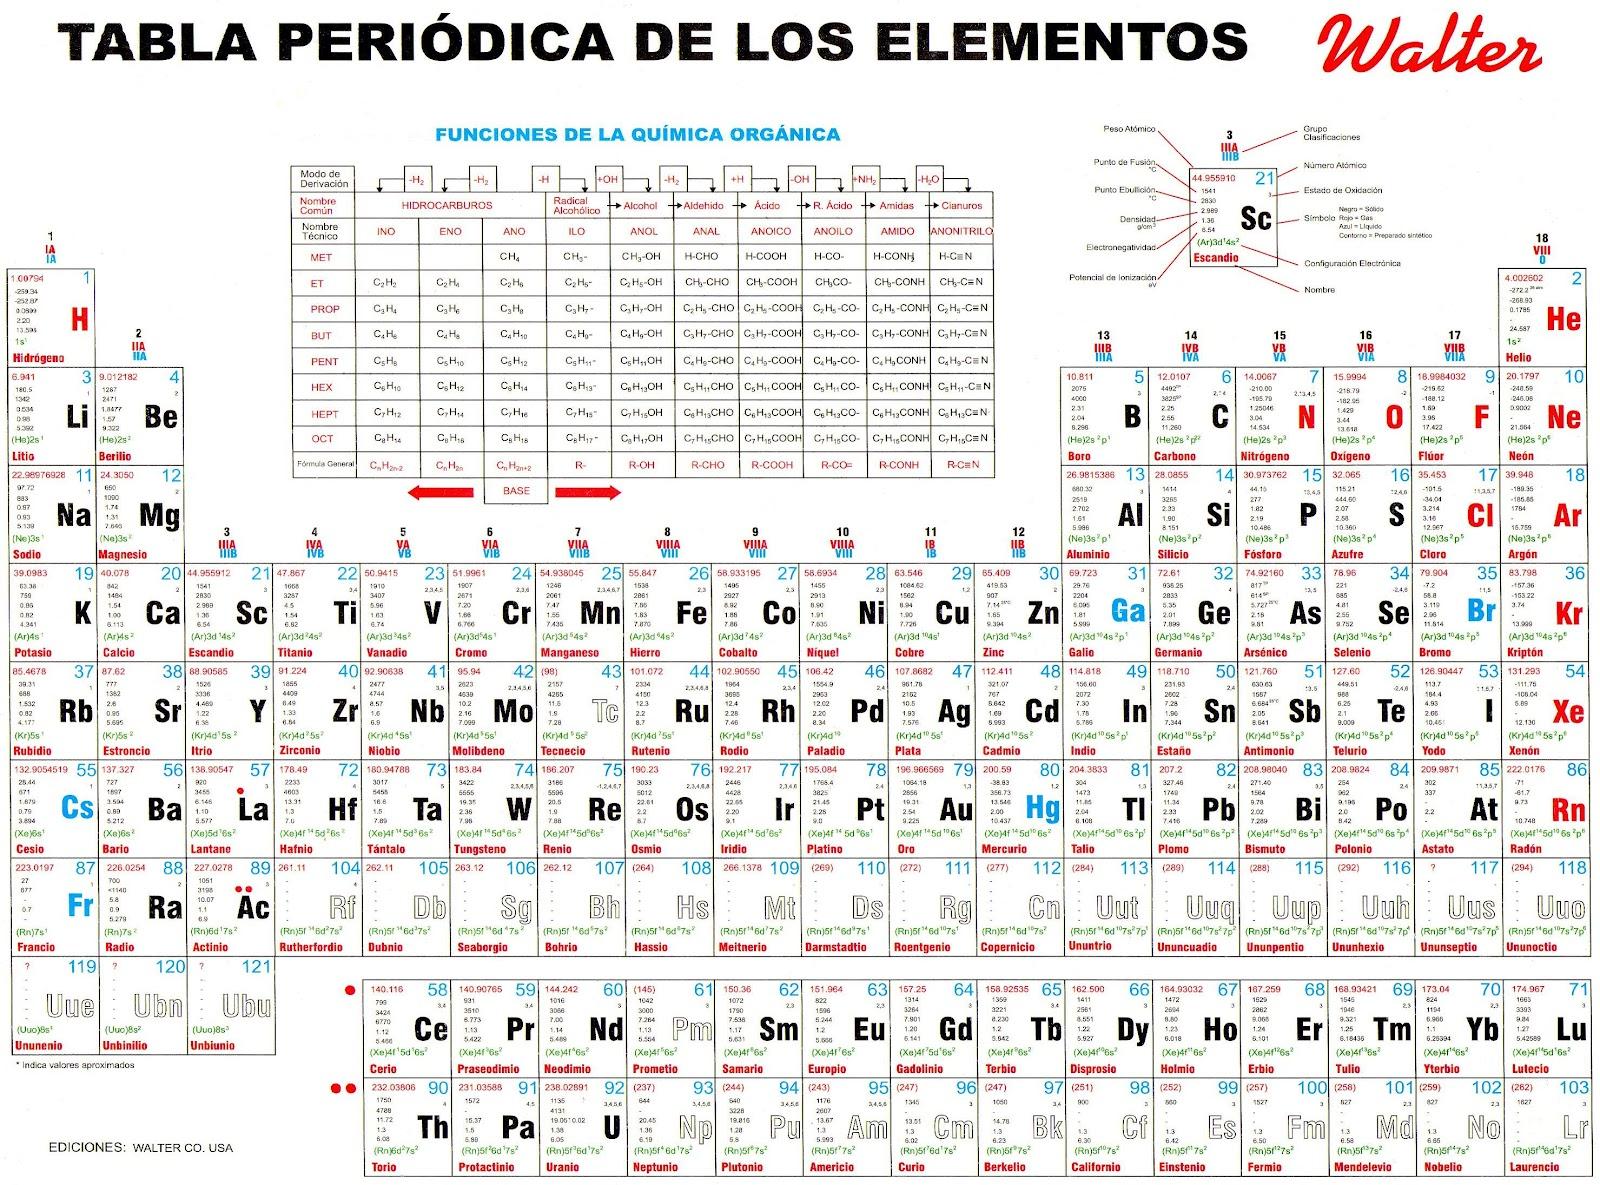 File tabla peri dica completa png wikimedia commons file tabla peri tablas peri dicas de los elementos qu micos actualizadas urtaz Image collections